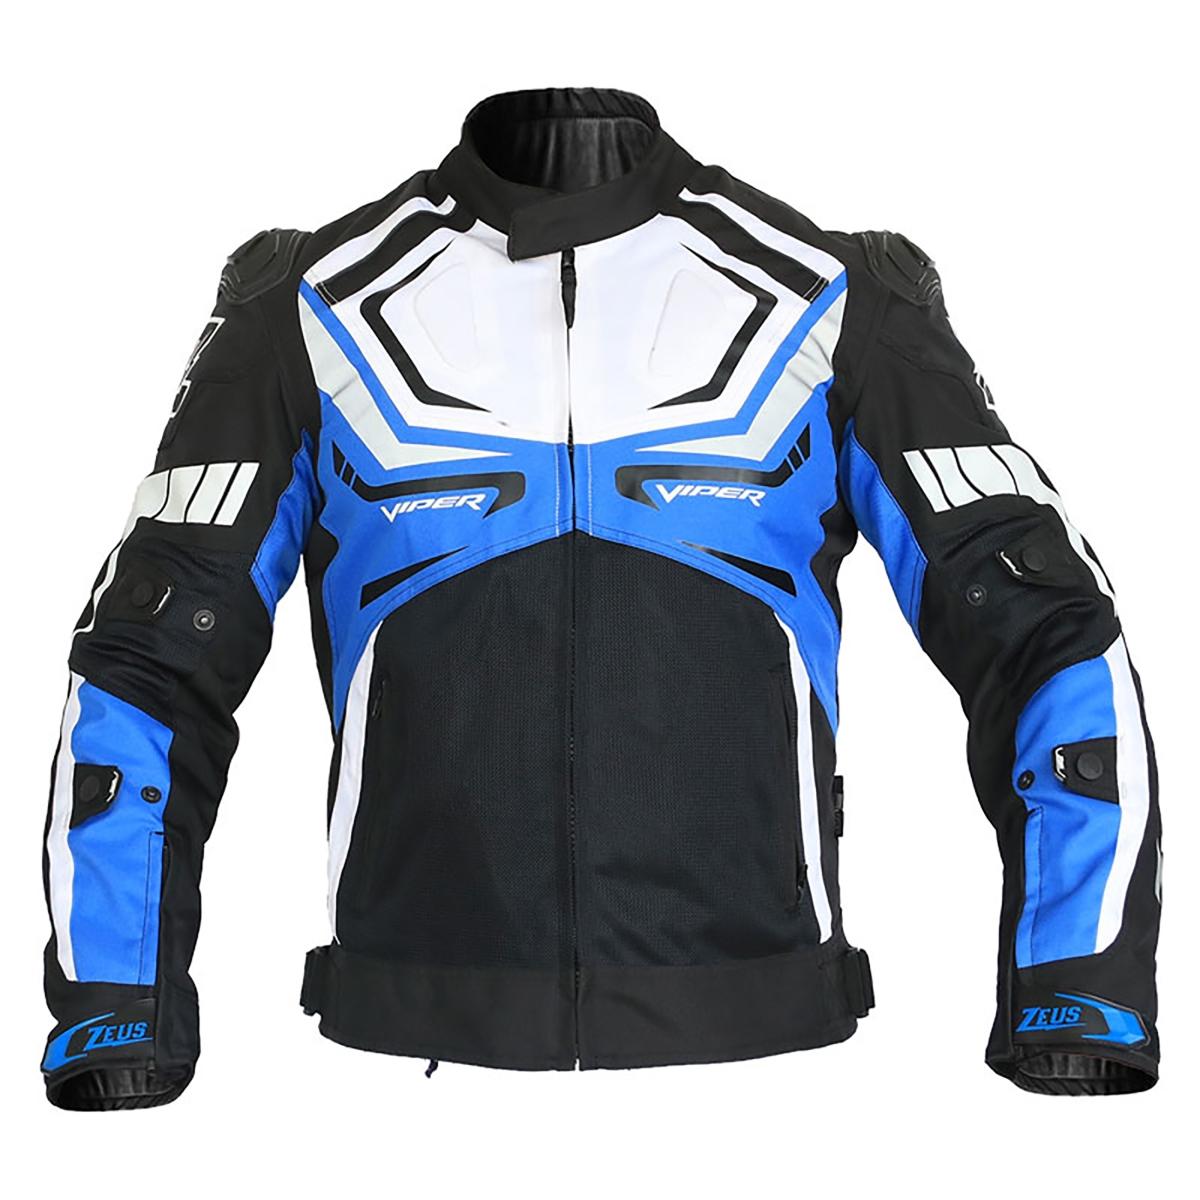 Motorcycle Gear: Zeus Viper Riding Jacket